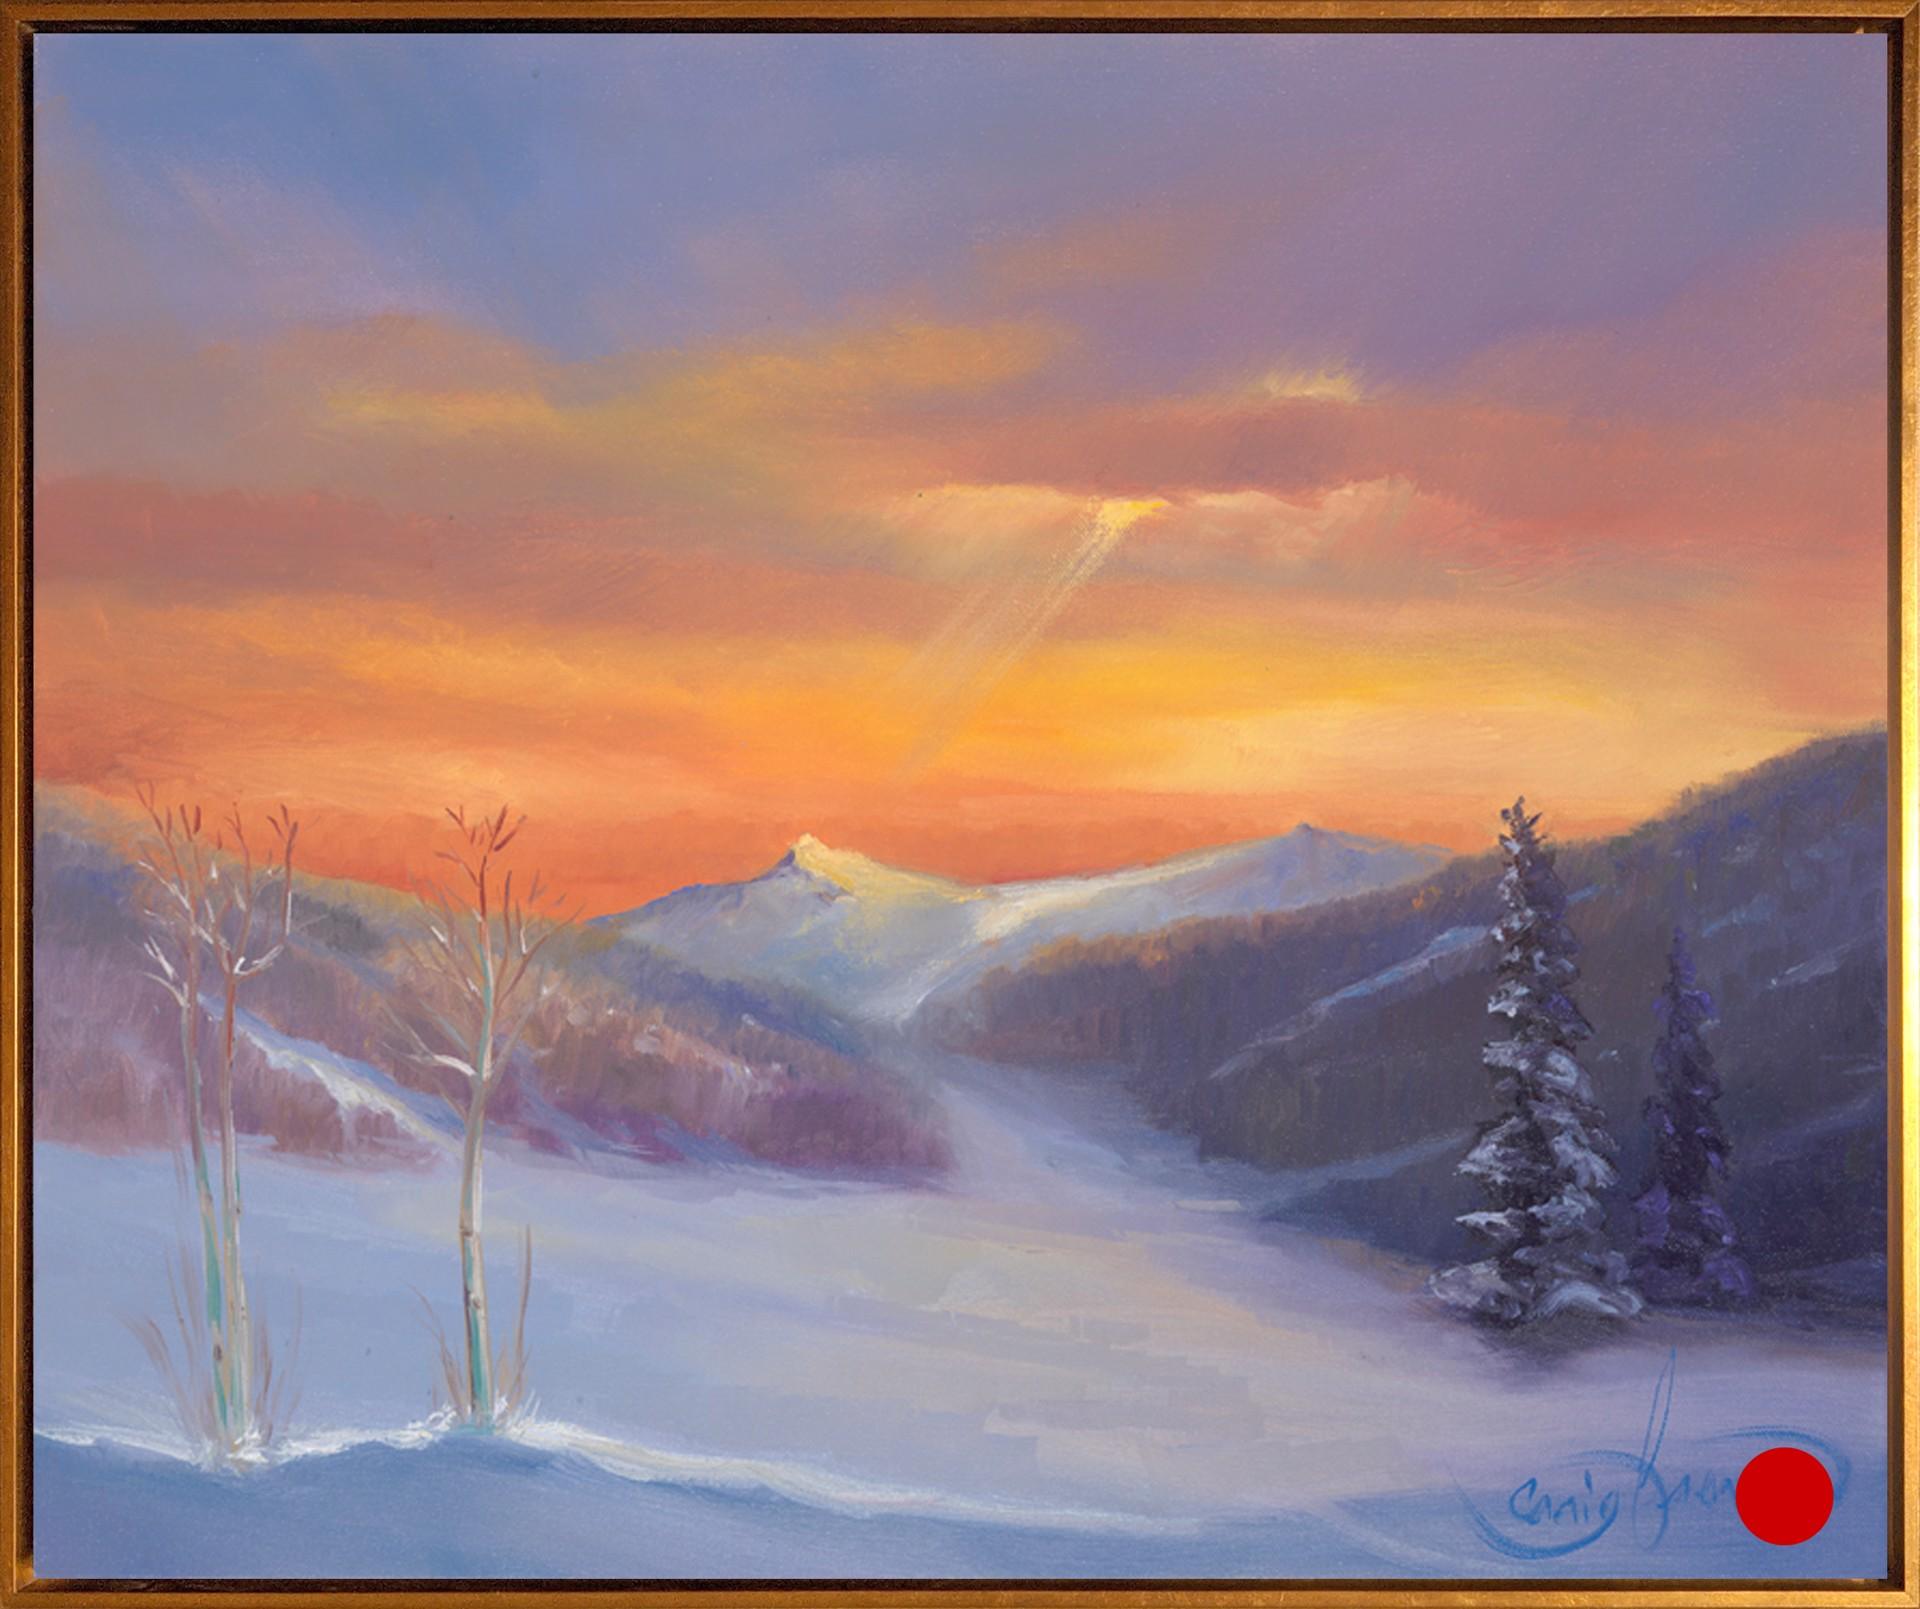 Sunset at Keystone by Craig Freeman